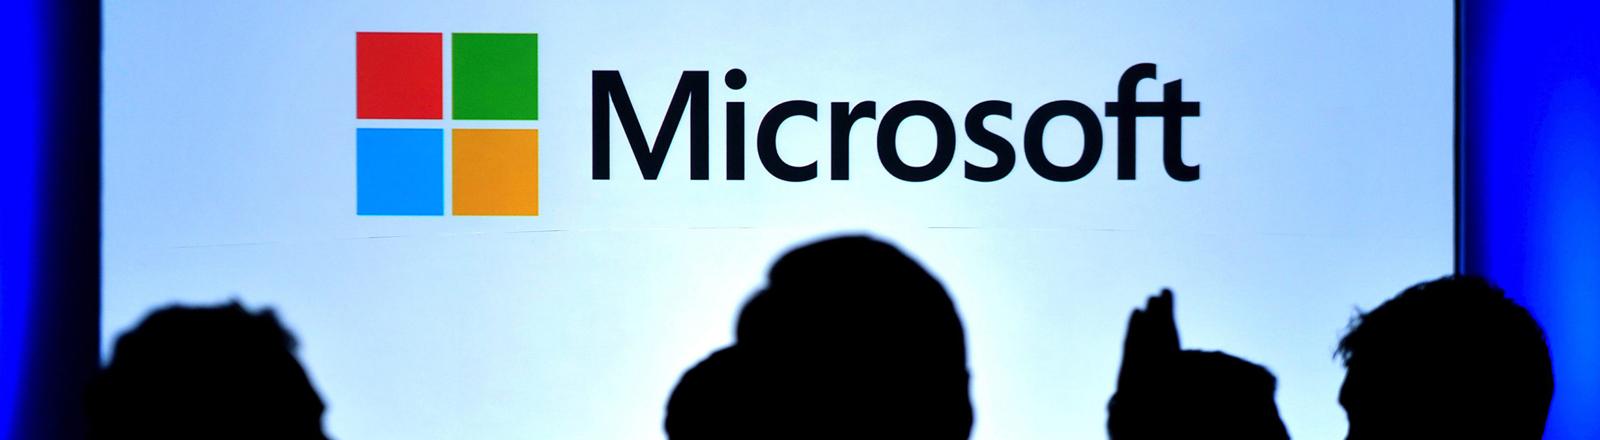 Besucher vor dem Microsoft-Logo